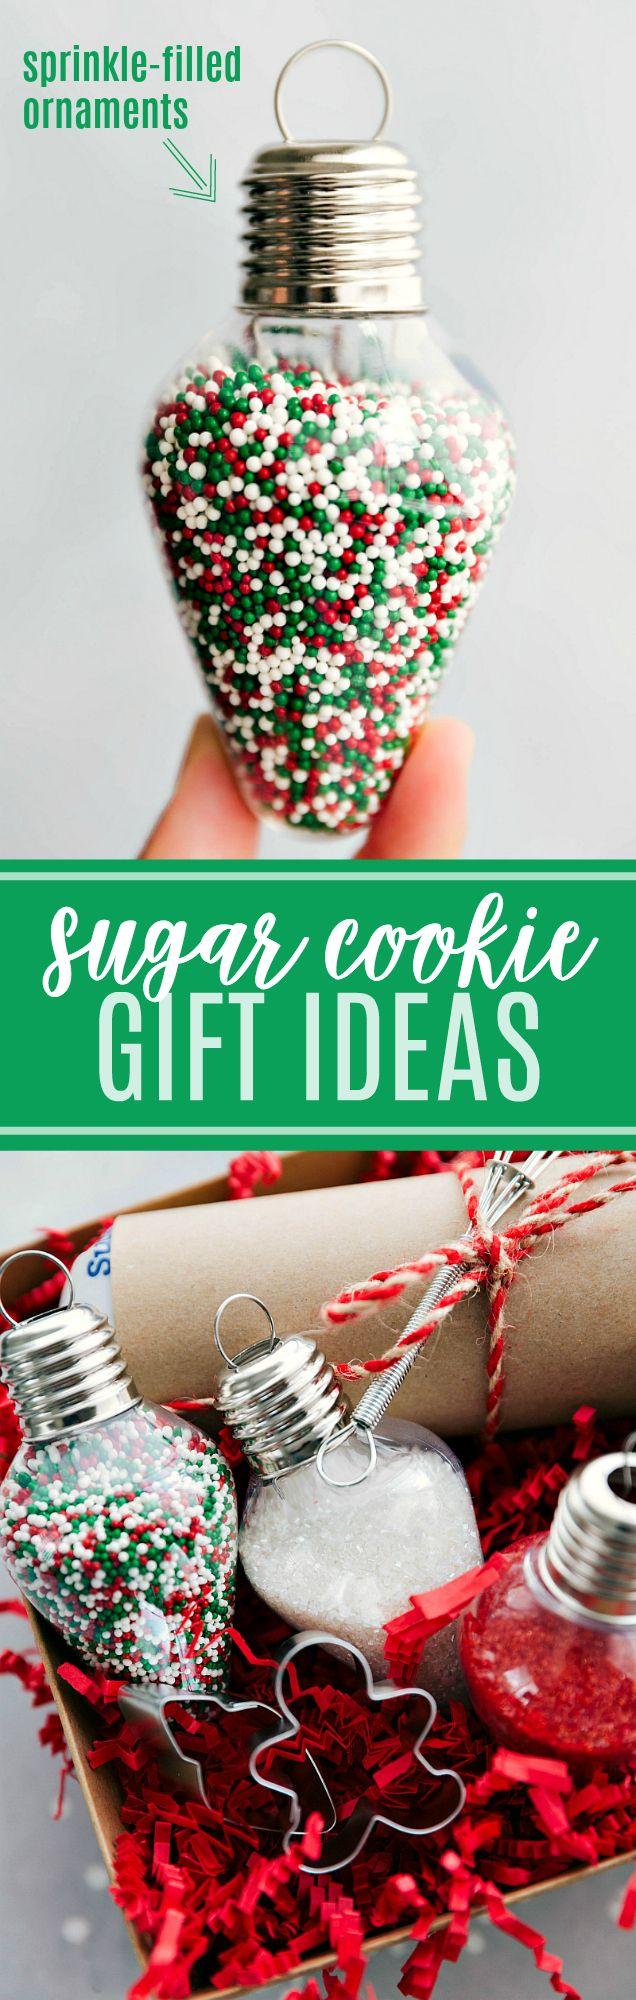 Sugar Cookie Christmas Kit Ideas! Fill small ornaments